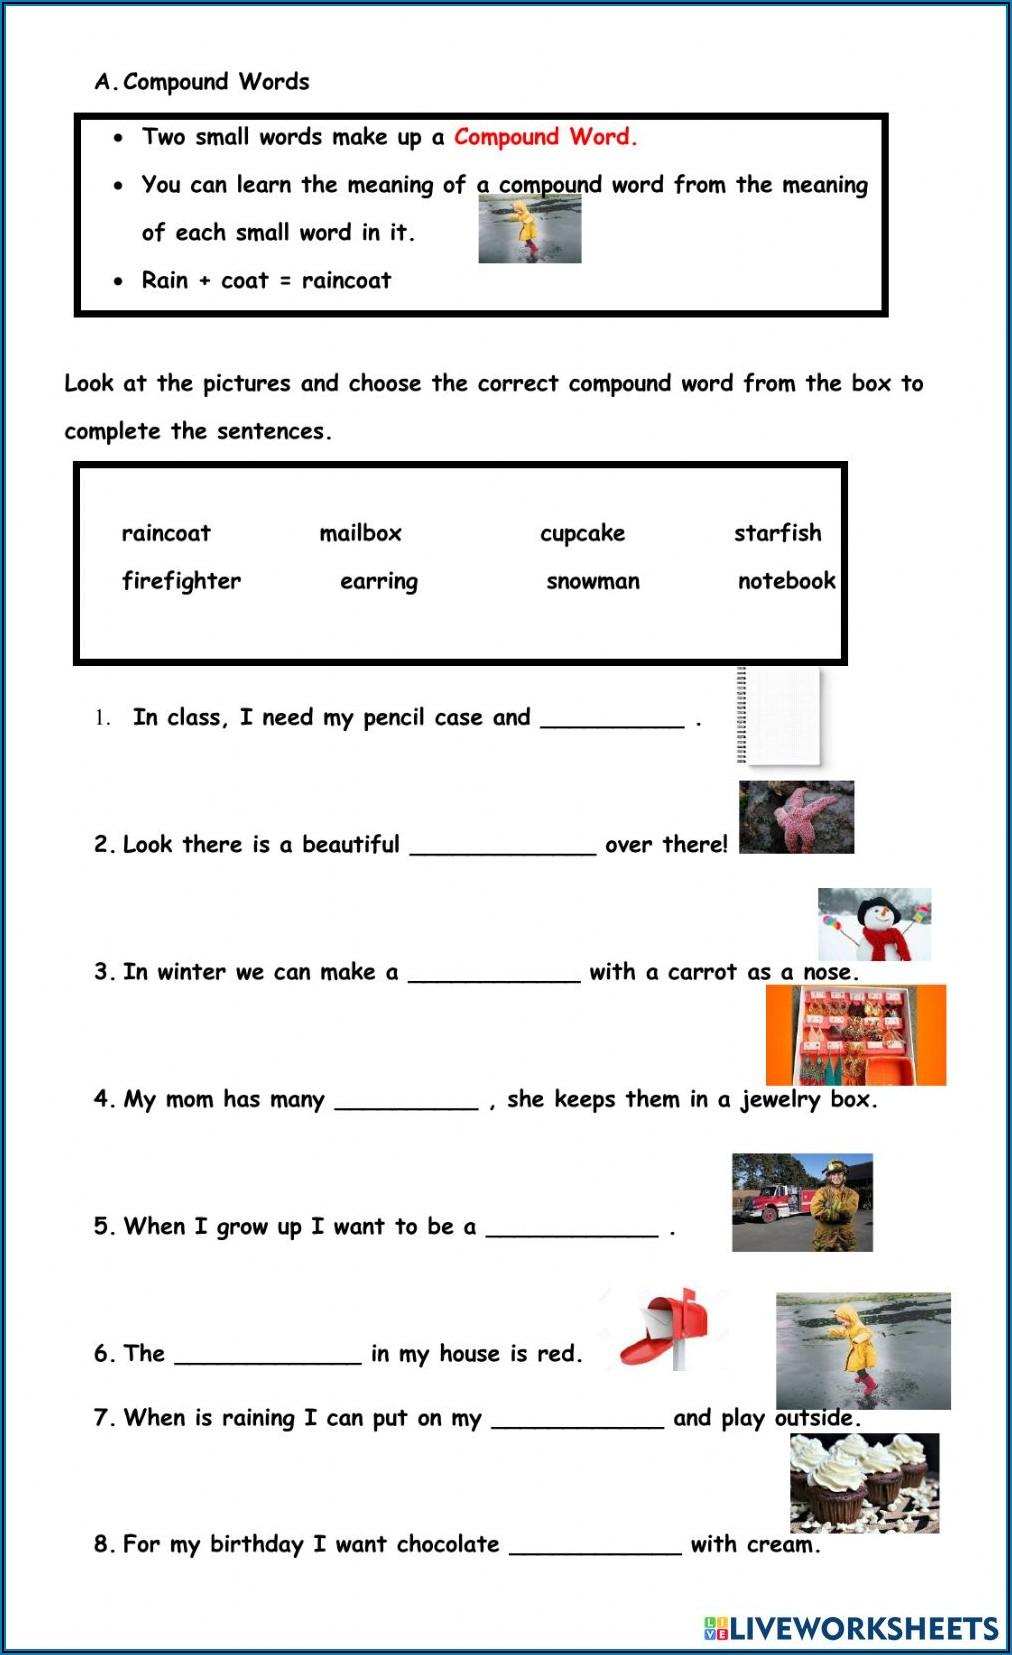 Compound Words Worksheet For 3rd Grade